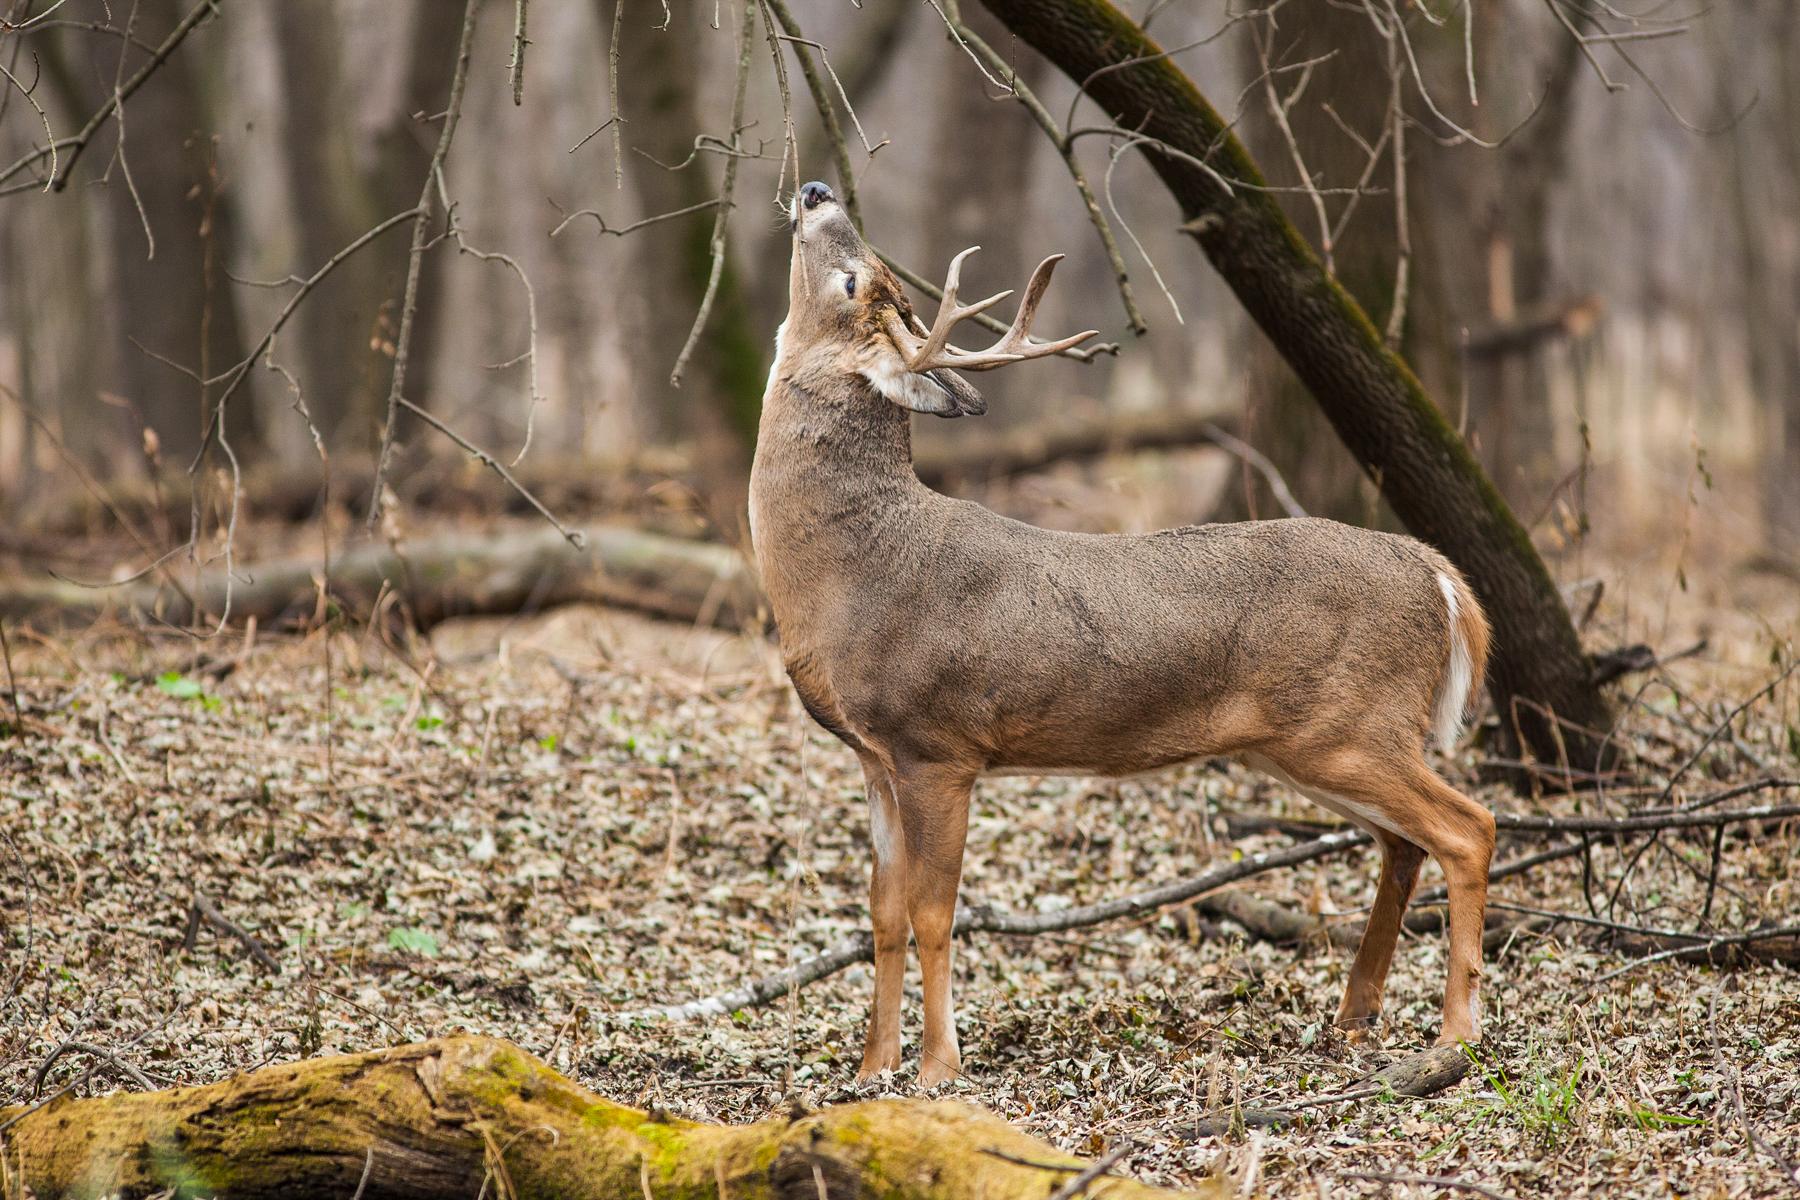 A deer looking up (NPS/Gordon Dietzman)